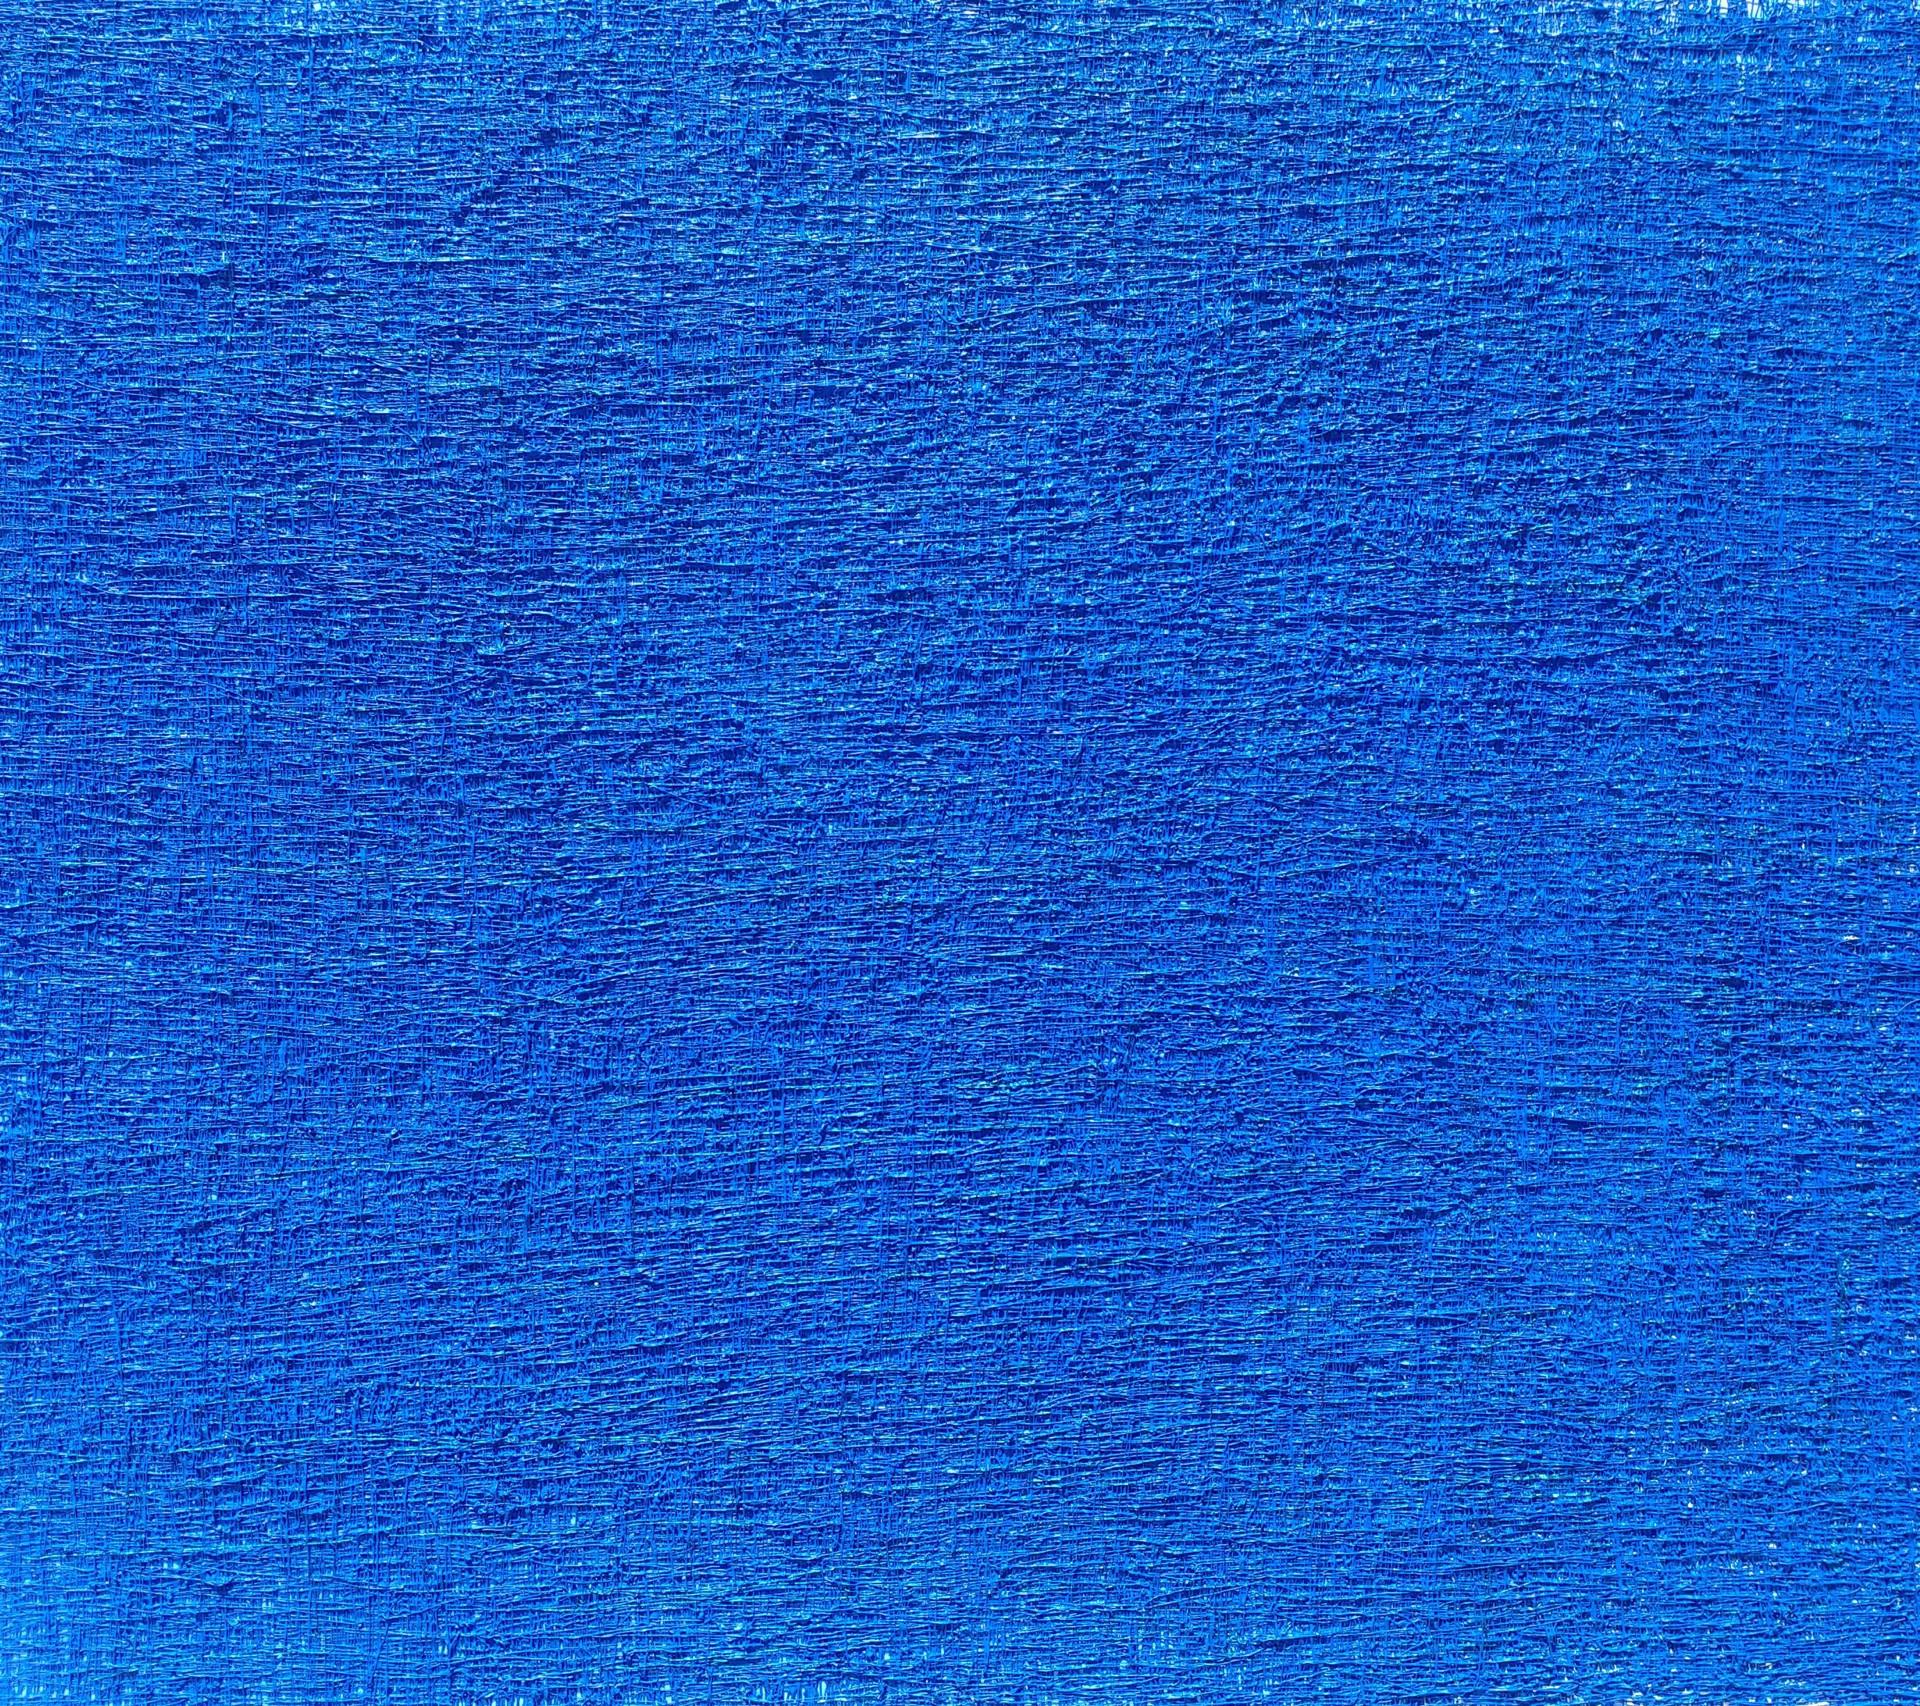 Squared Blue by Bill Pugh